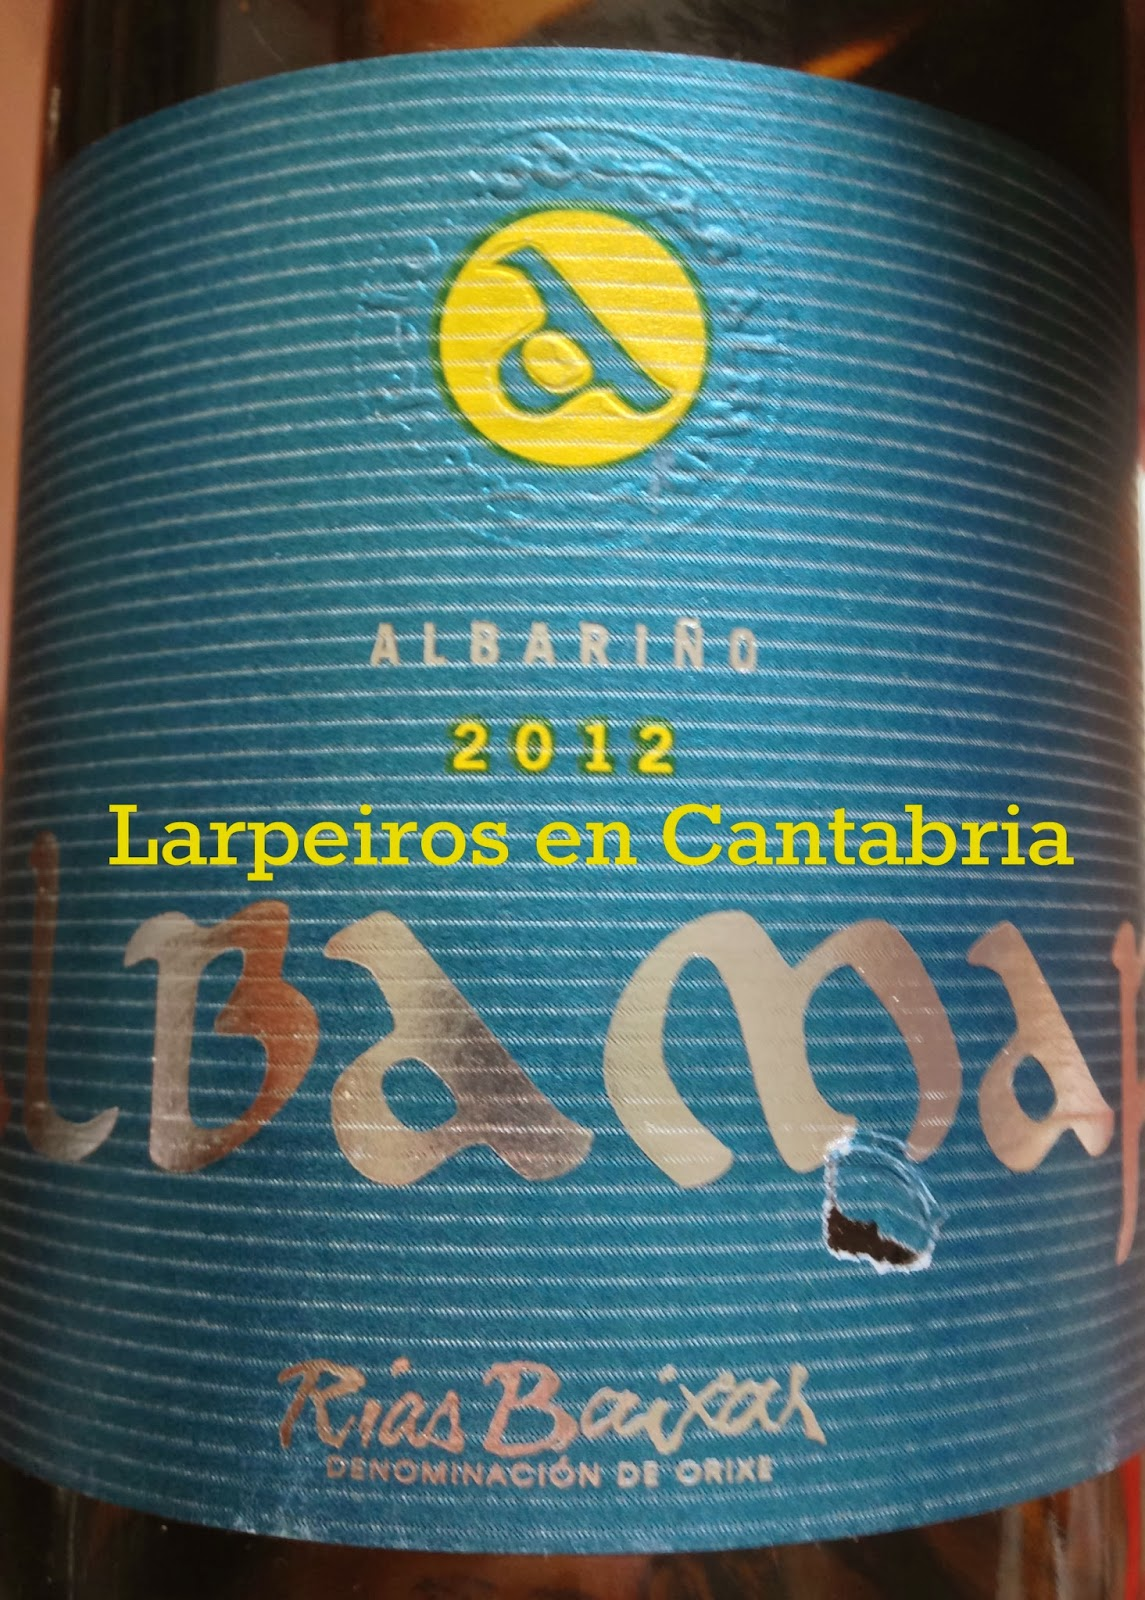 Vino Blanco Albamar 2012, Merece la pena tomar más.